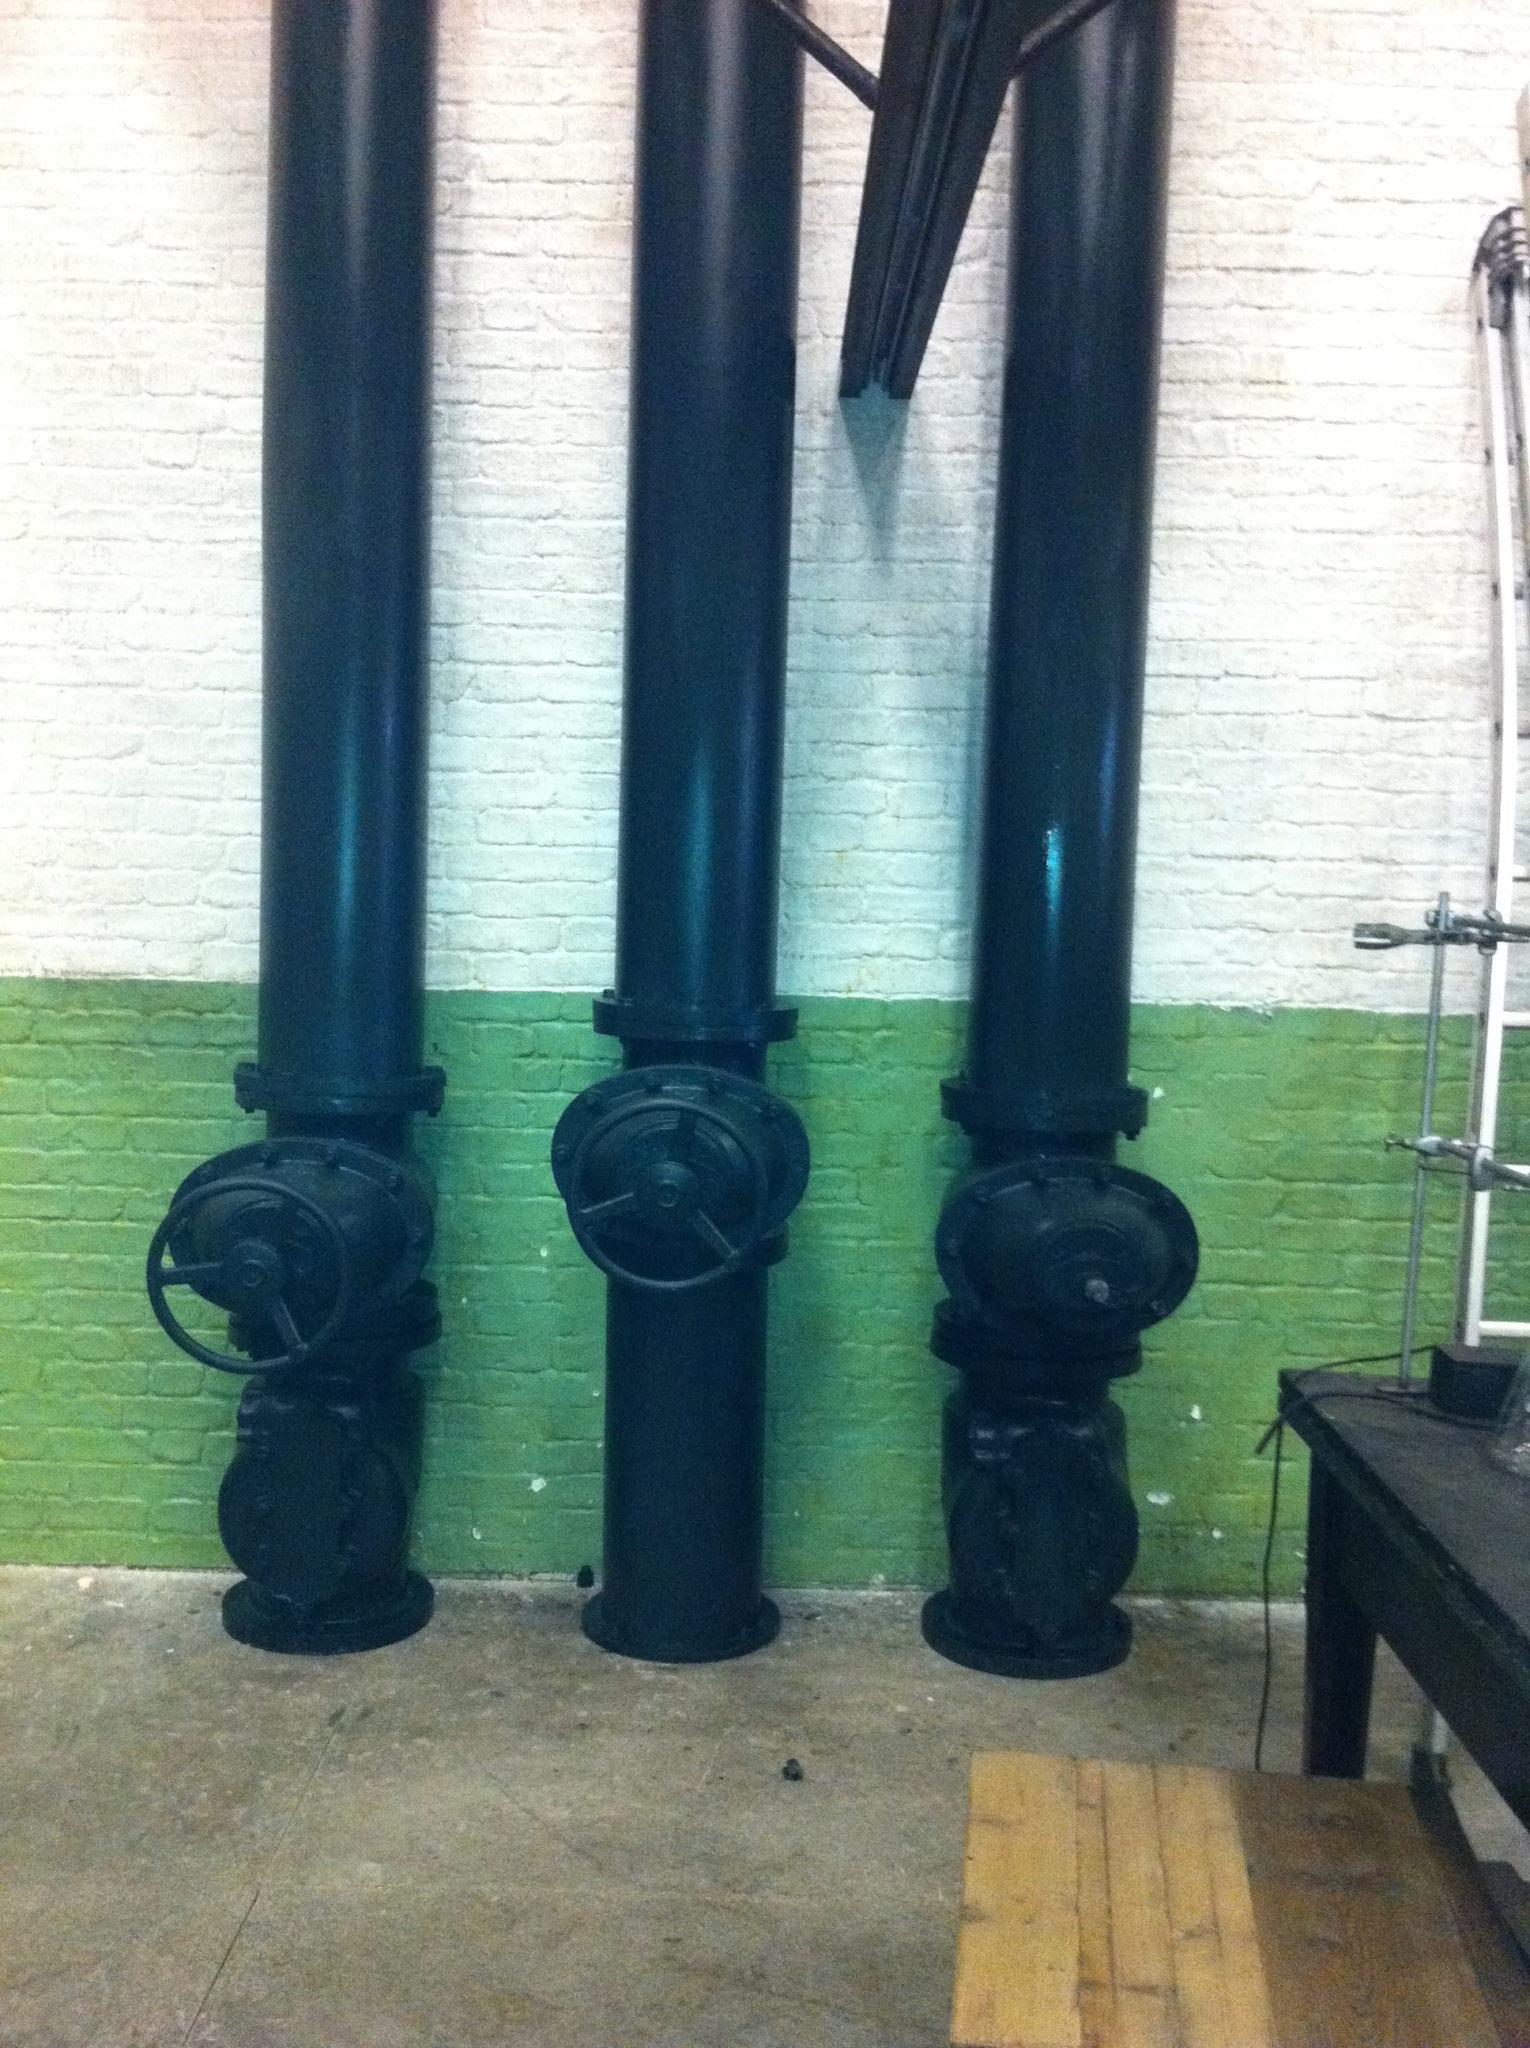 Large Black Pipes - Large Black Pipes